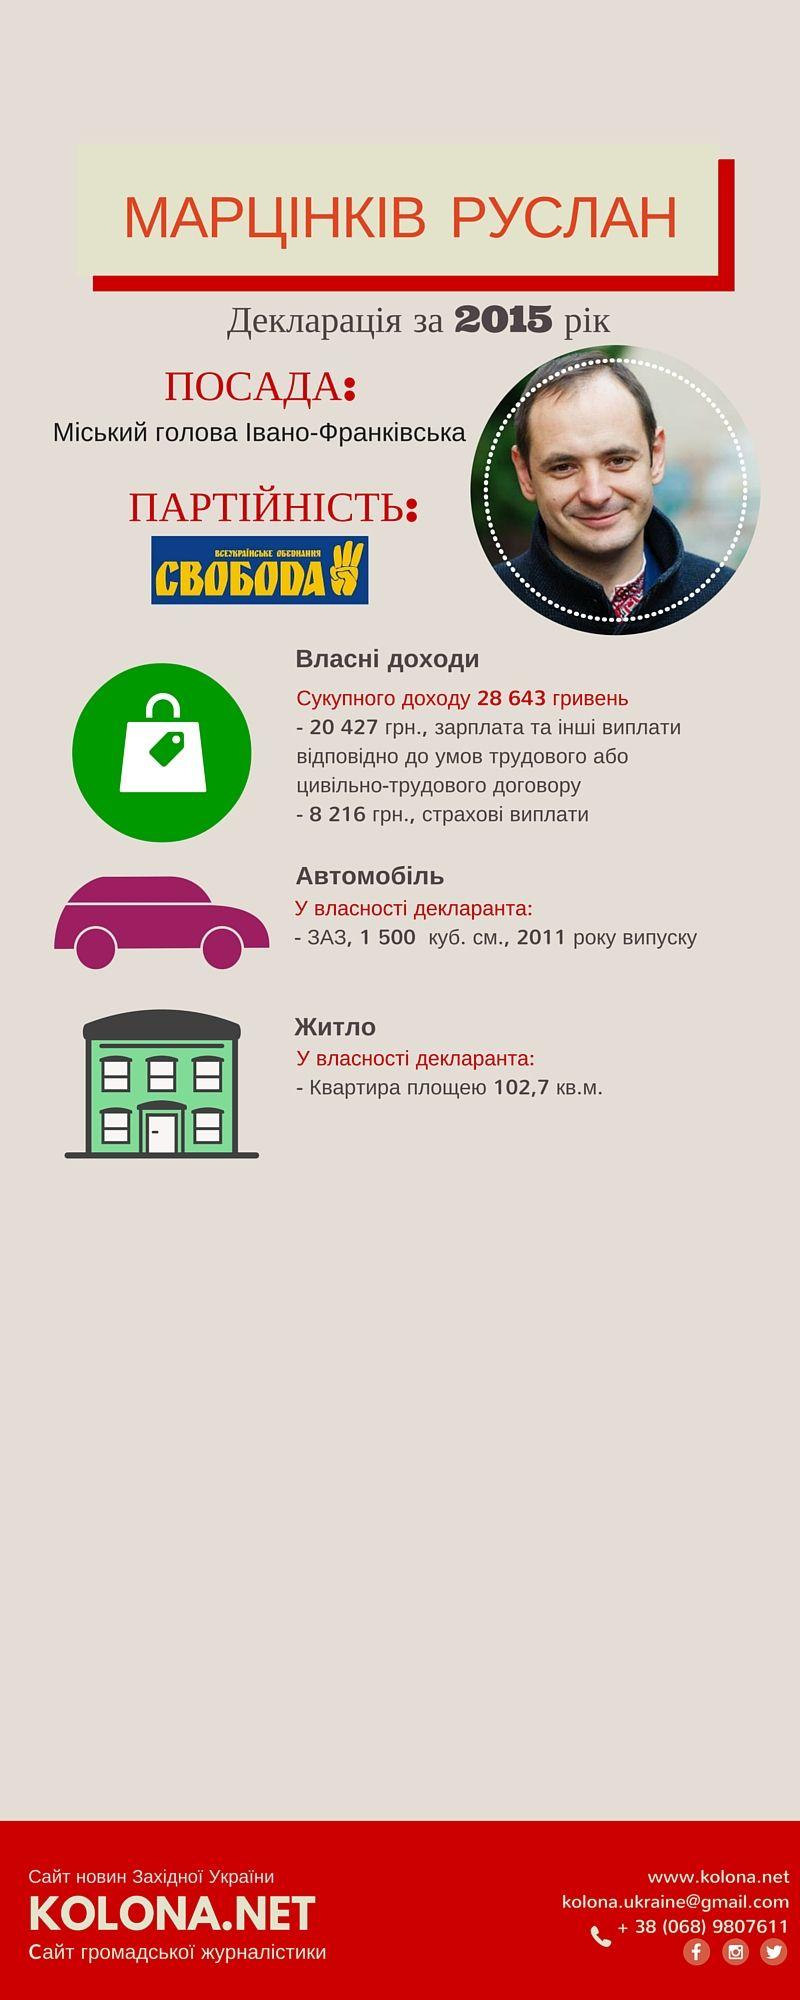 Copy of Copy of Copy of Copy of Copy of Copy of Copy of Copy of Декларація депутатів